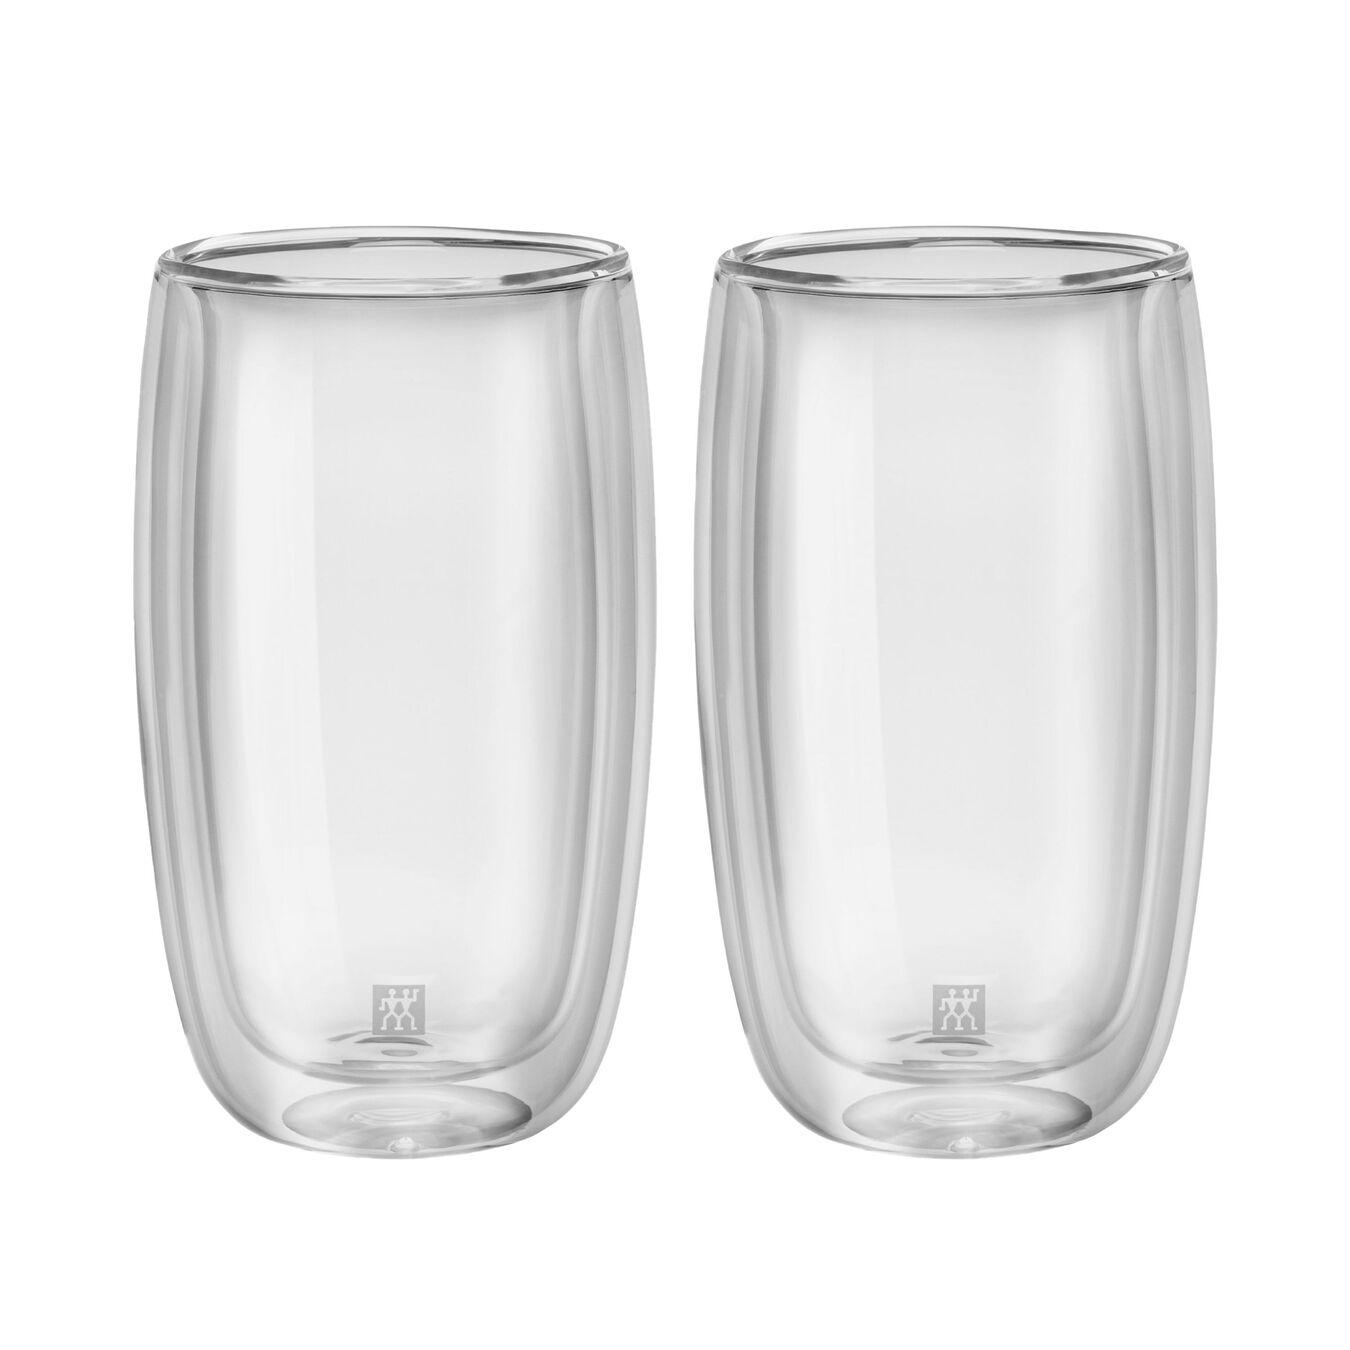 Set di bicchieri da latte - 2-pz., vetro borosilicato,,large 1